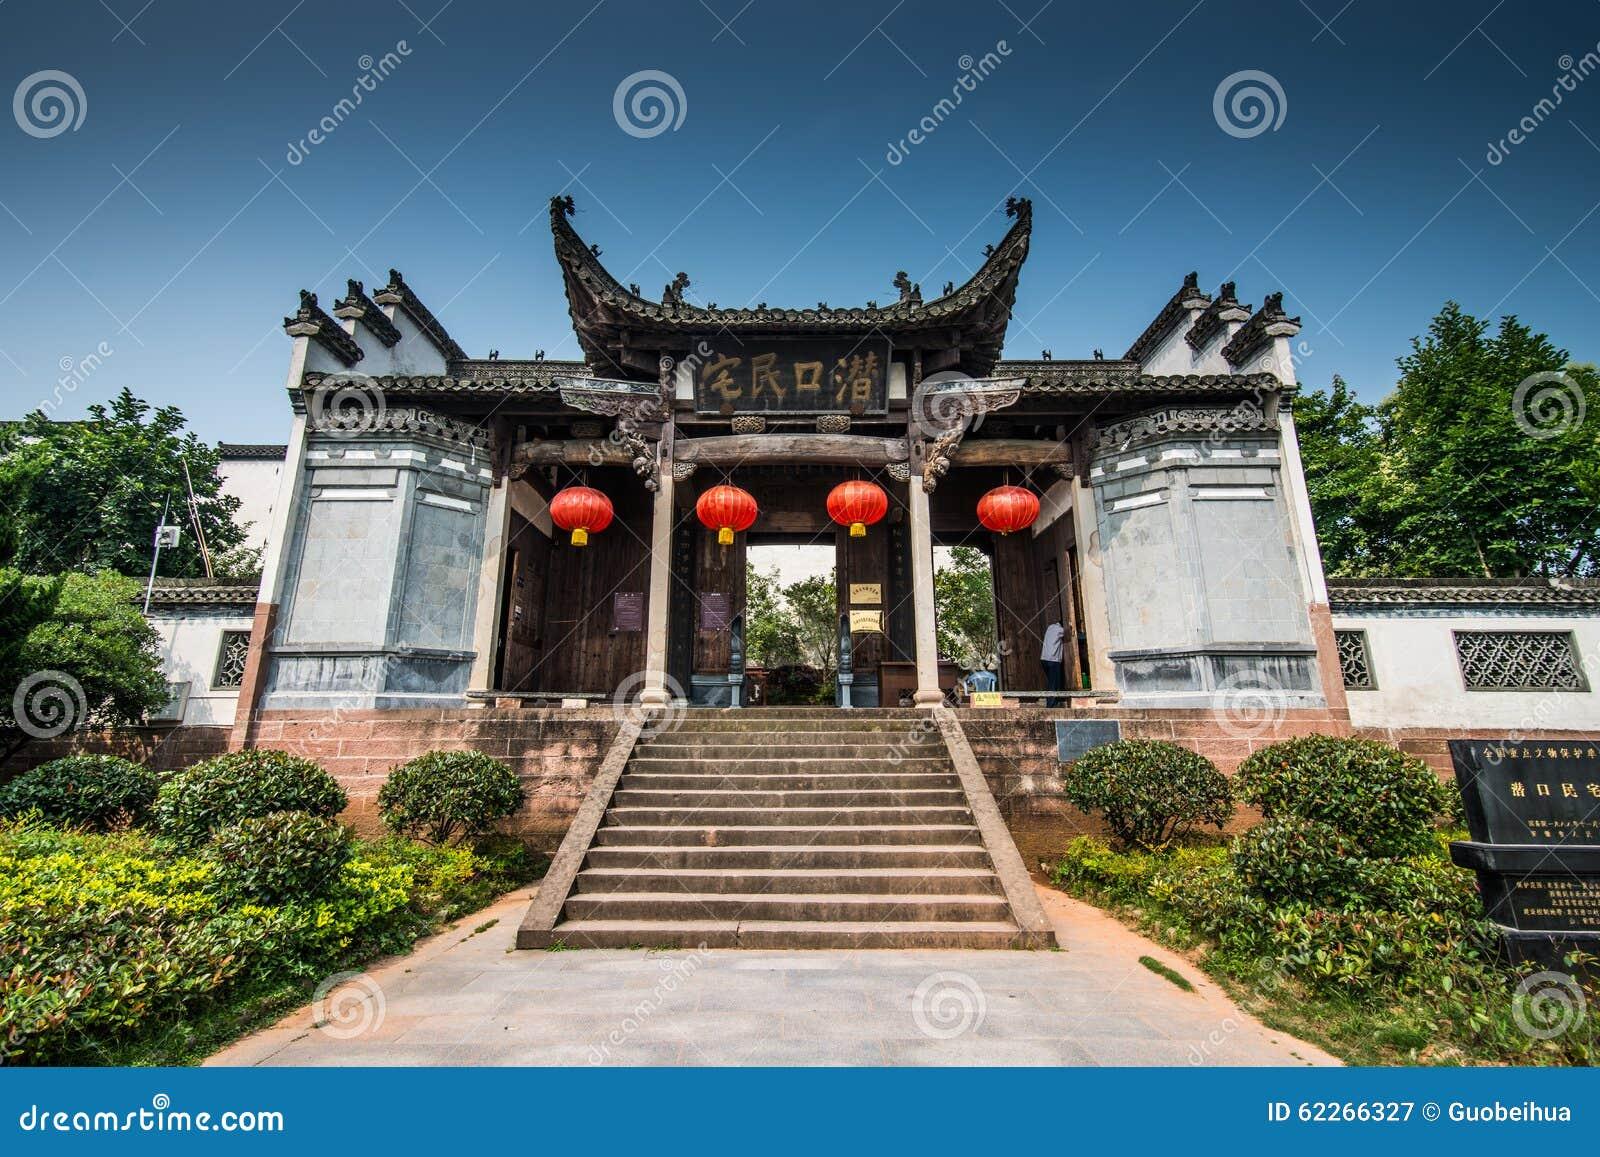 Musée de résidence de Huangshan Qiankou